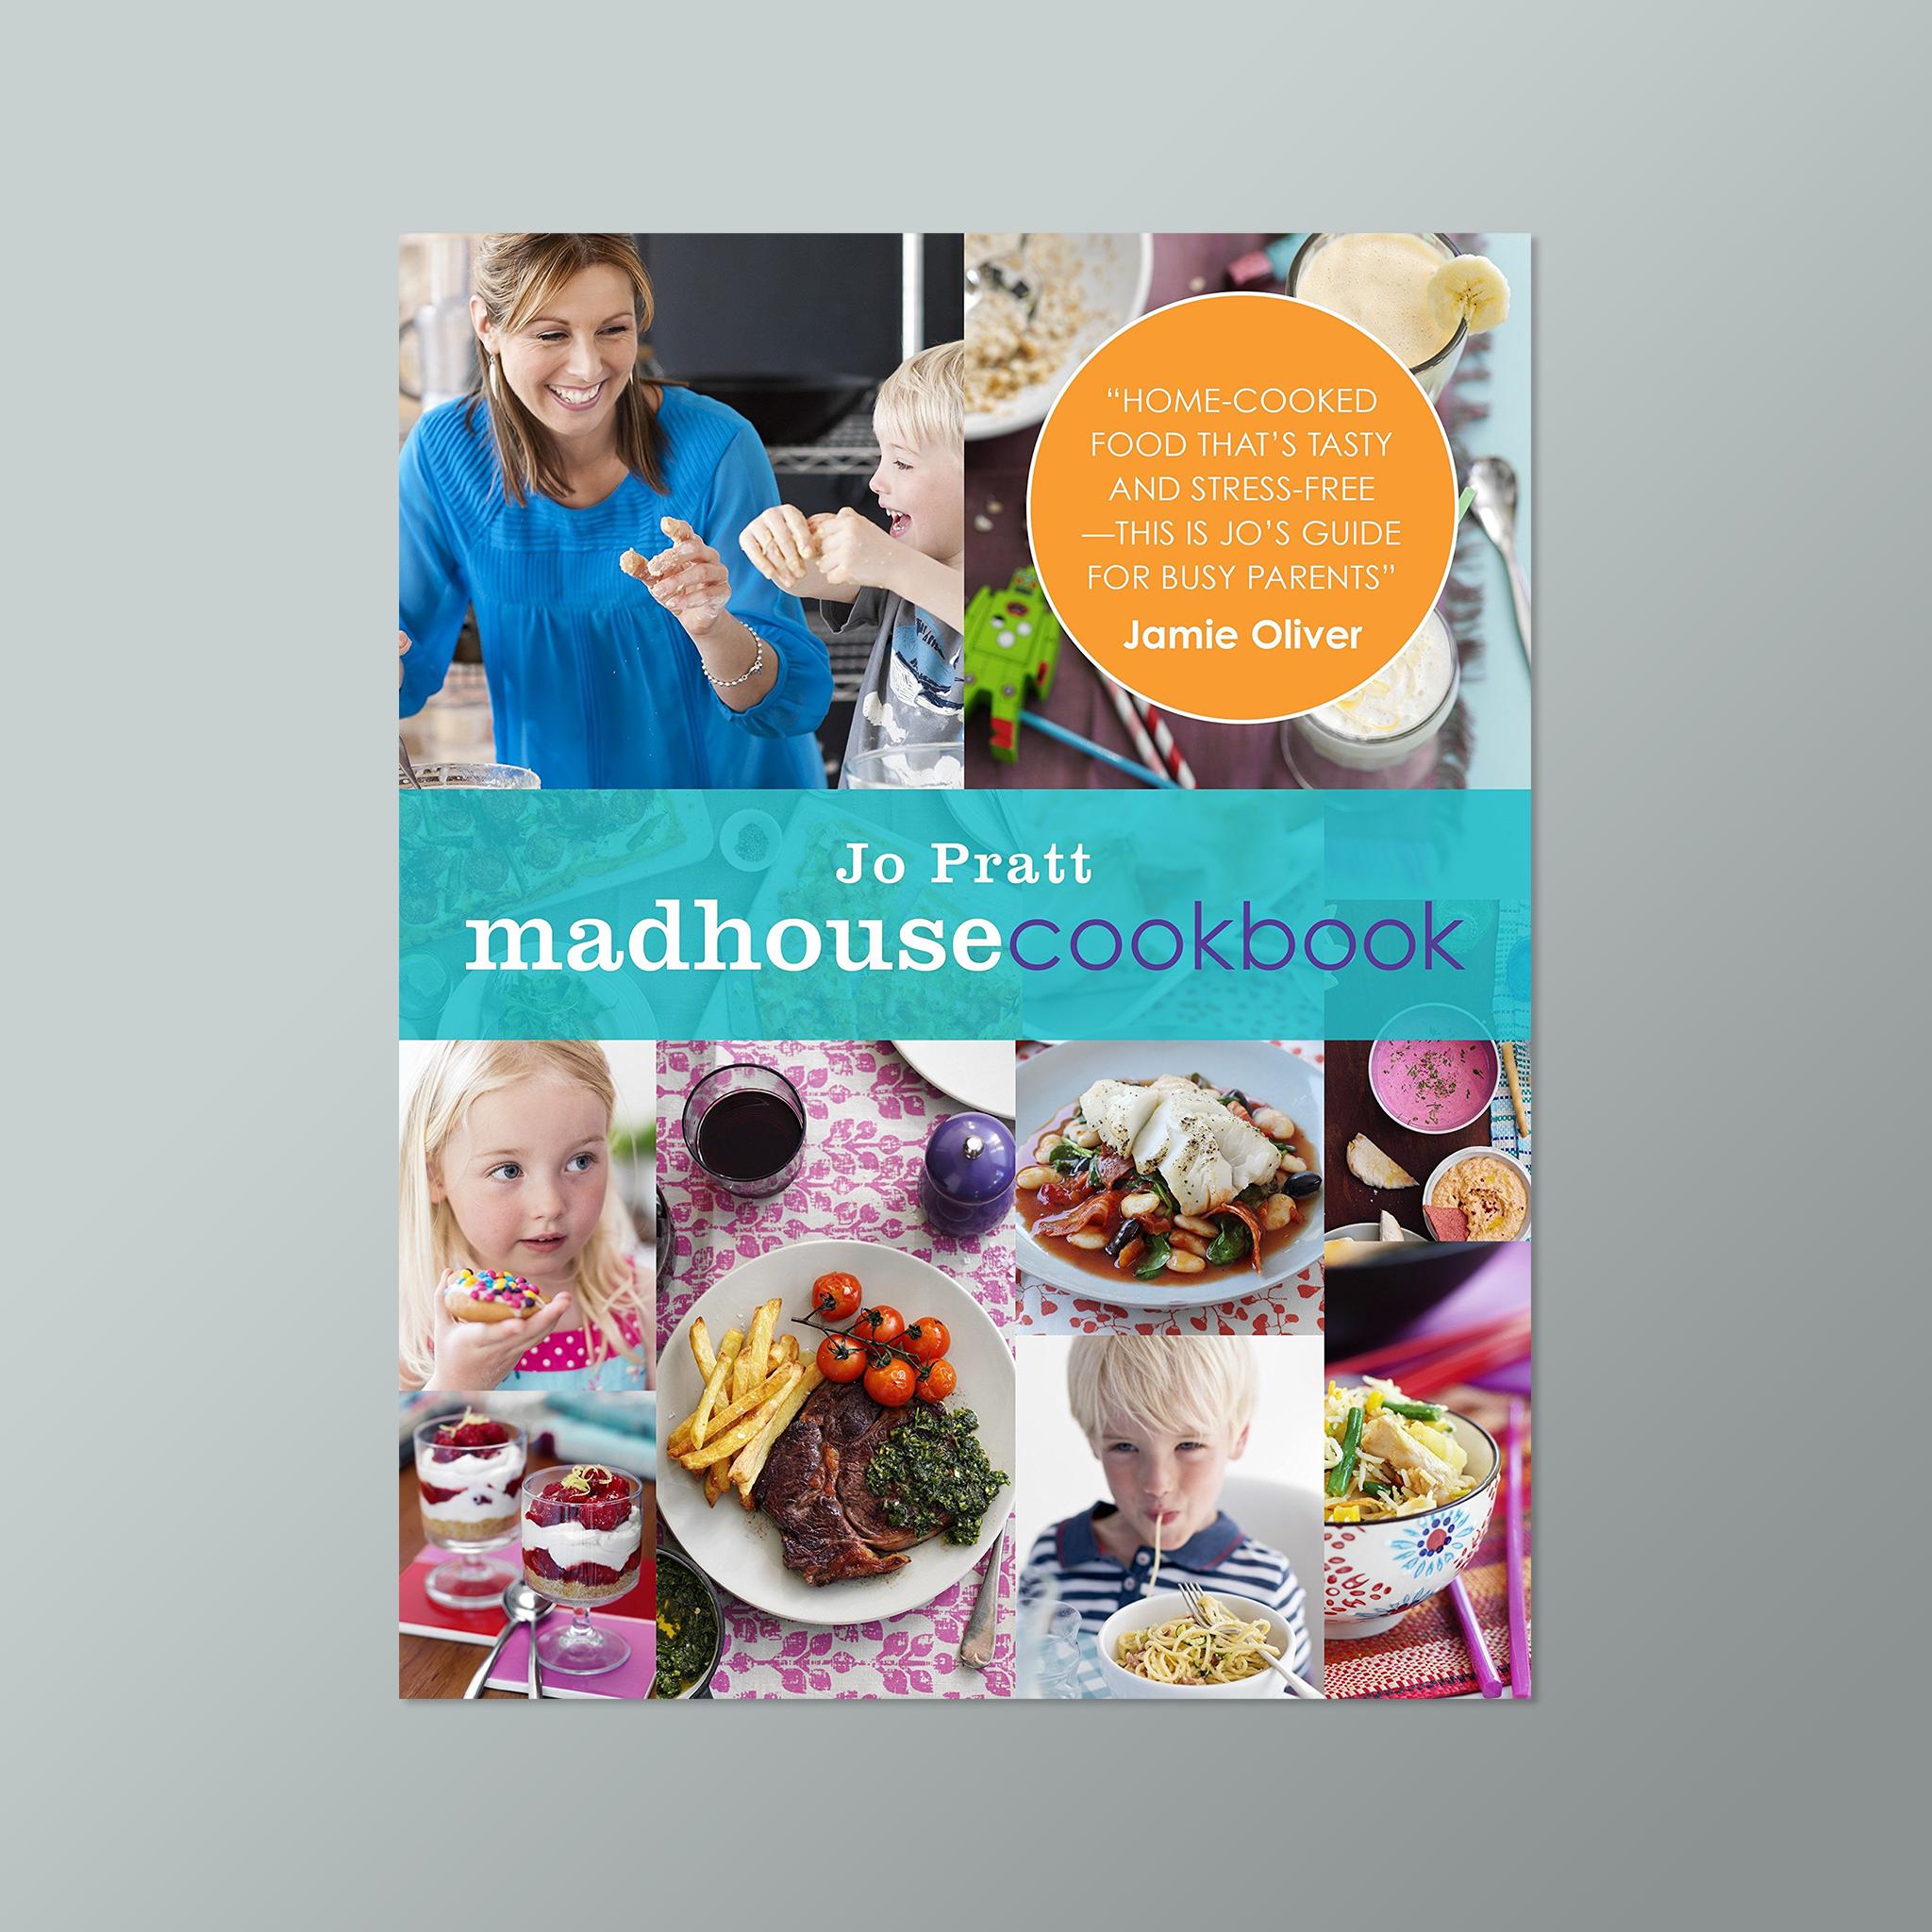 The Madhouse Cookbook by Jo Pratt